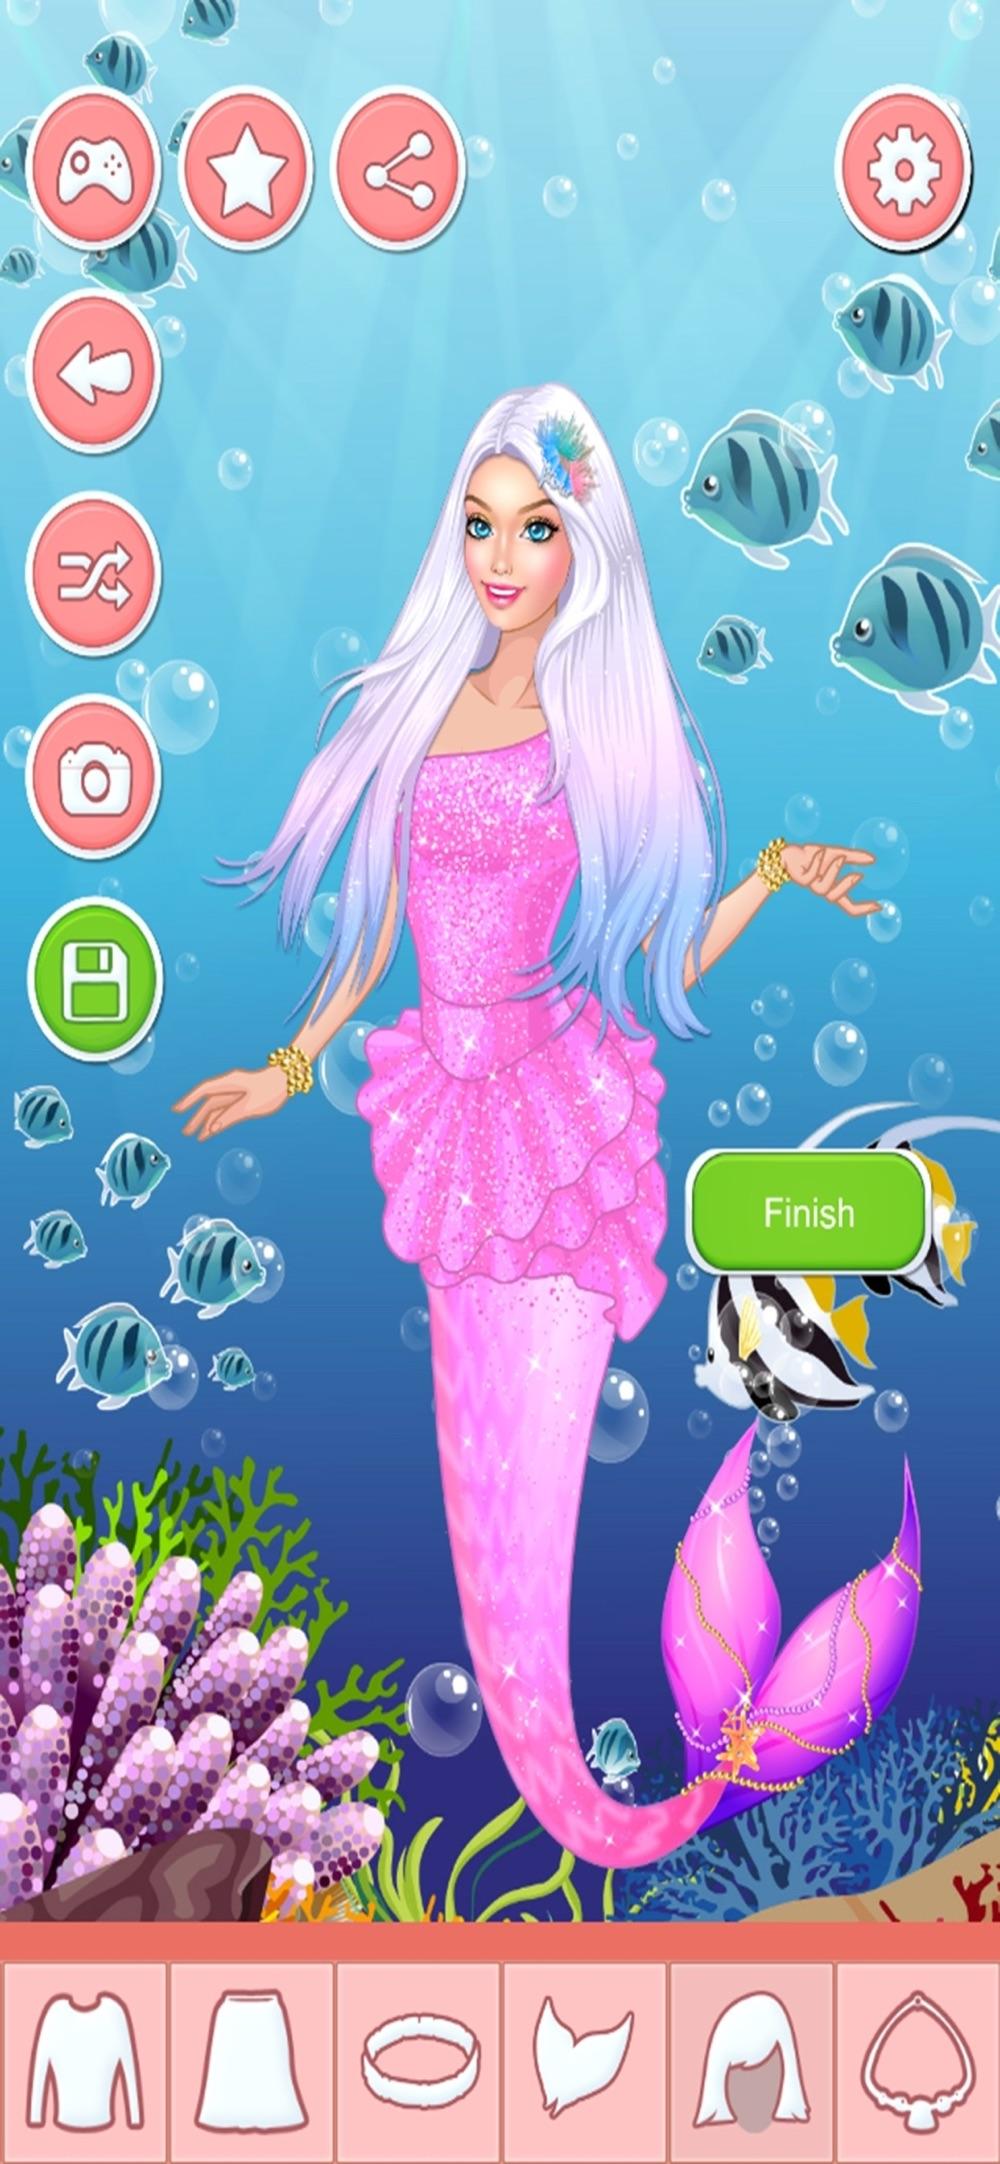 Mermaid Princess Beauty hack tool